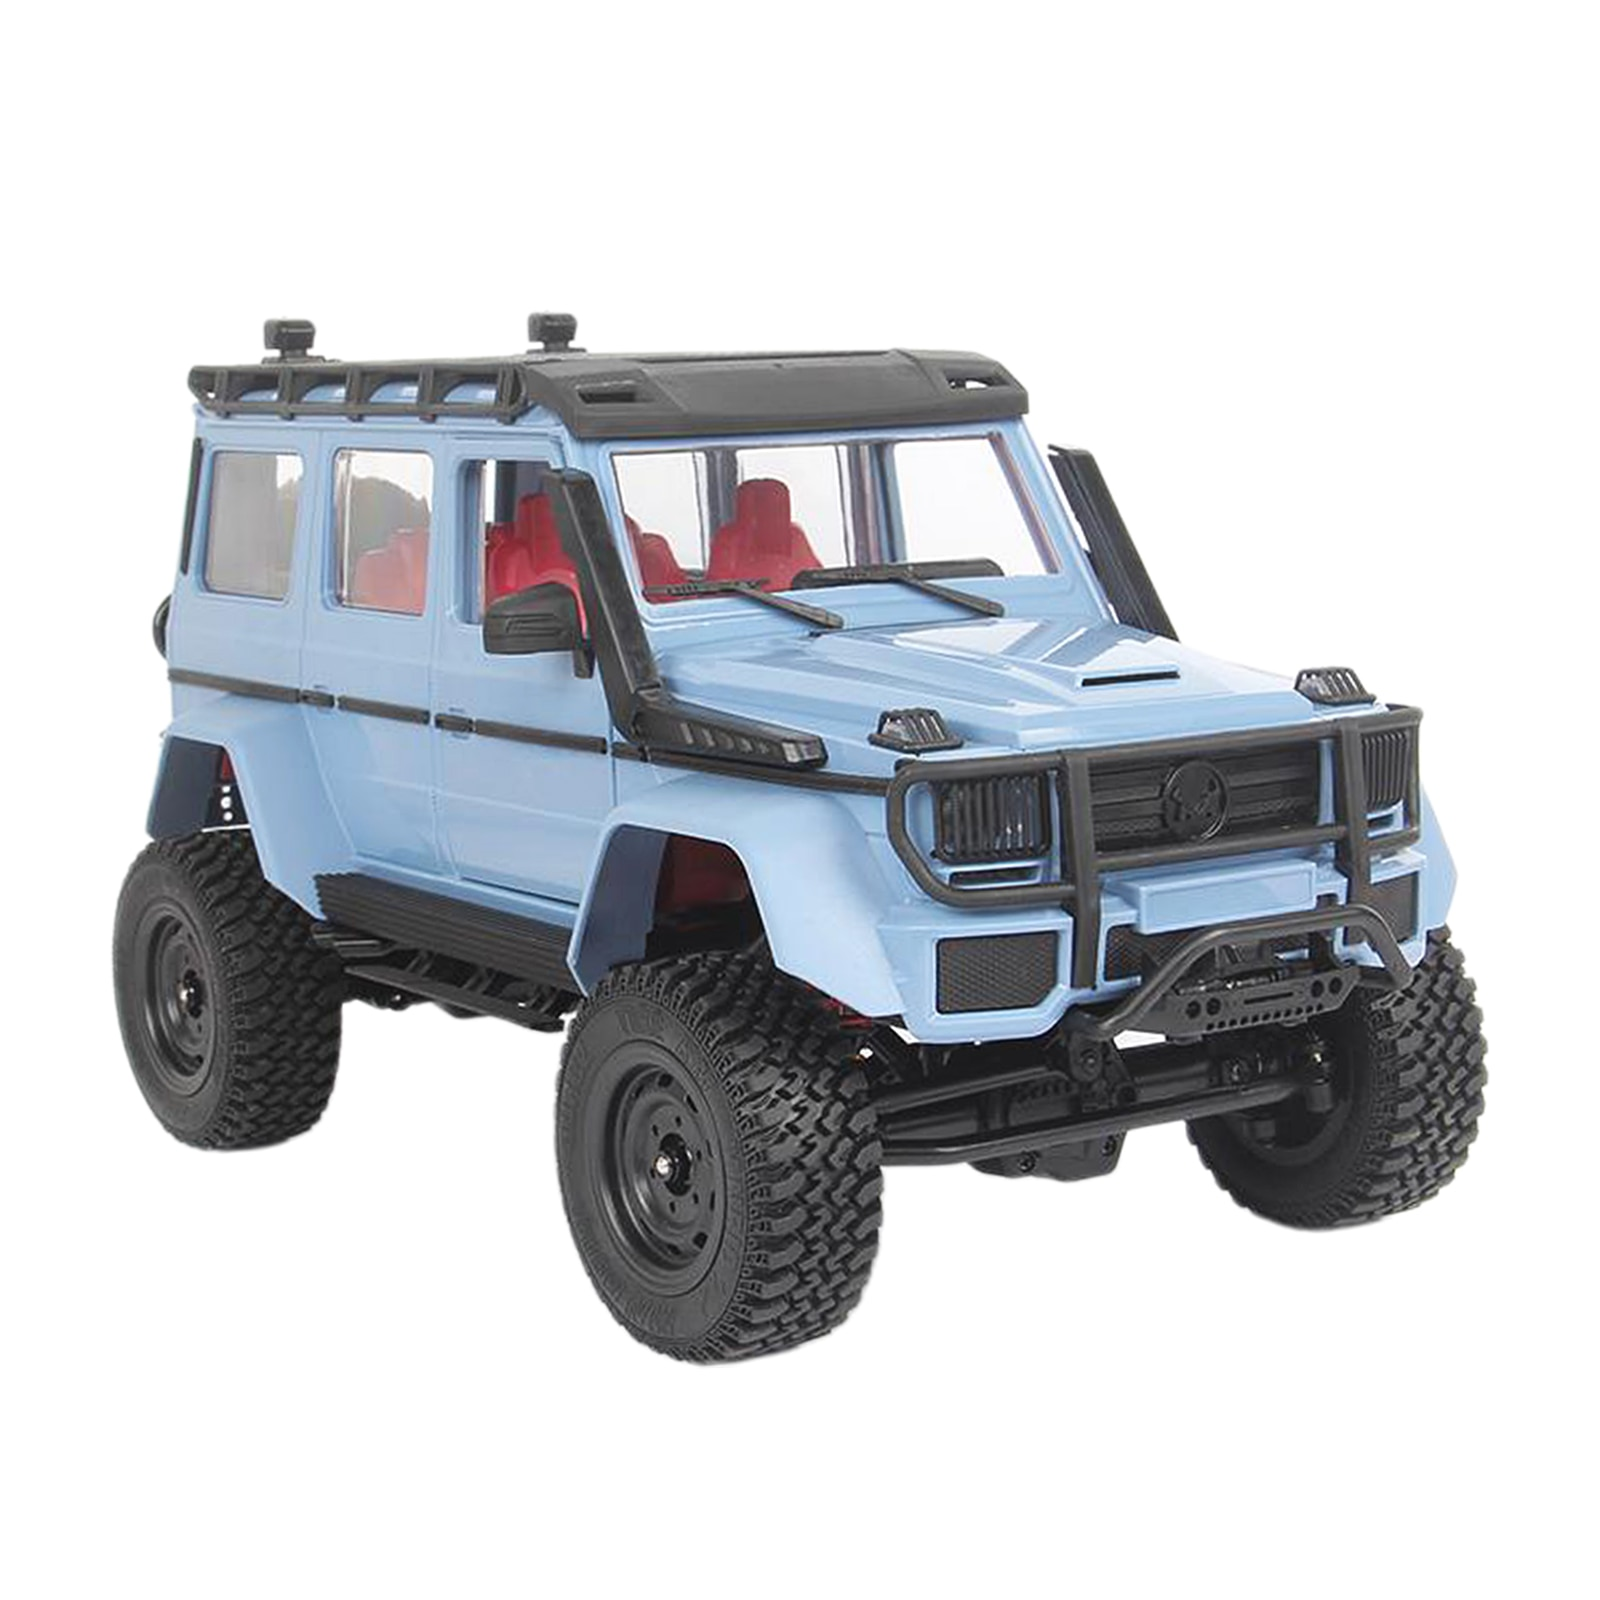 RC Car MN86K/MN86KS 1/12 Kit 4WD 23cm Wheelbase Crawler Off-Road Vehicle enlarge